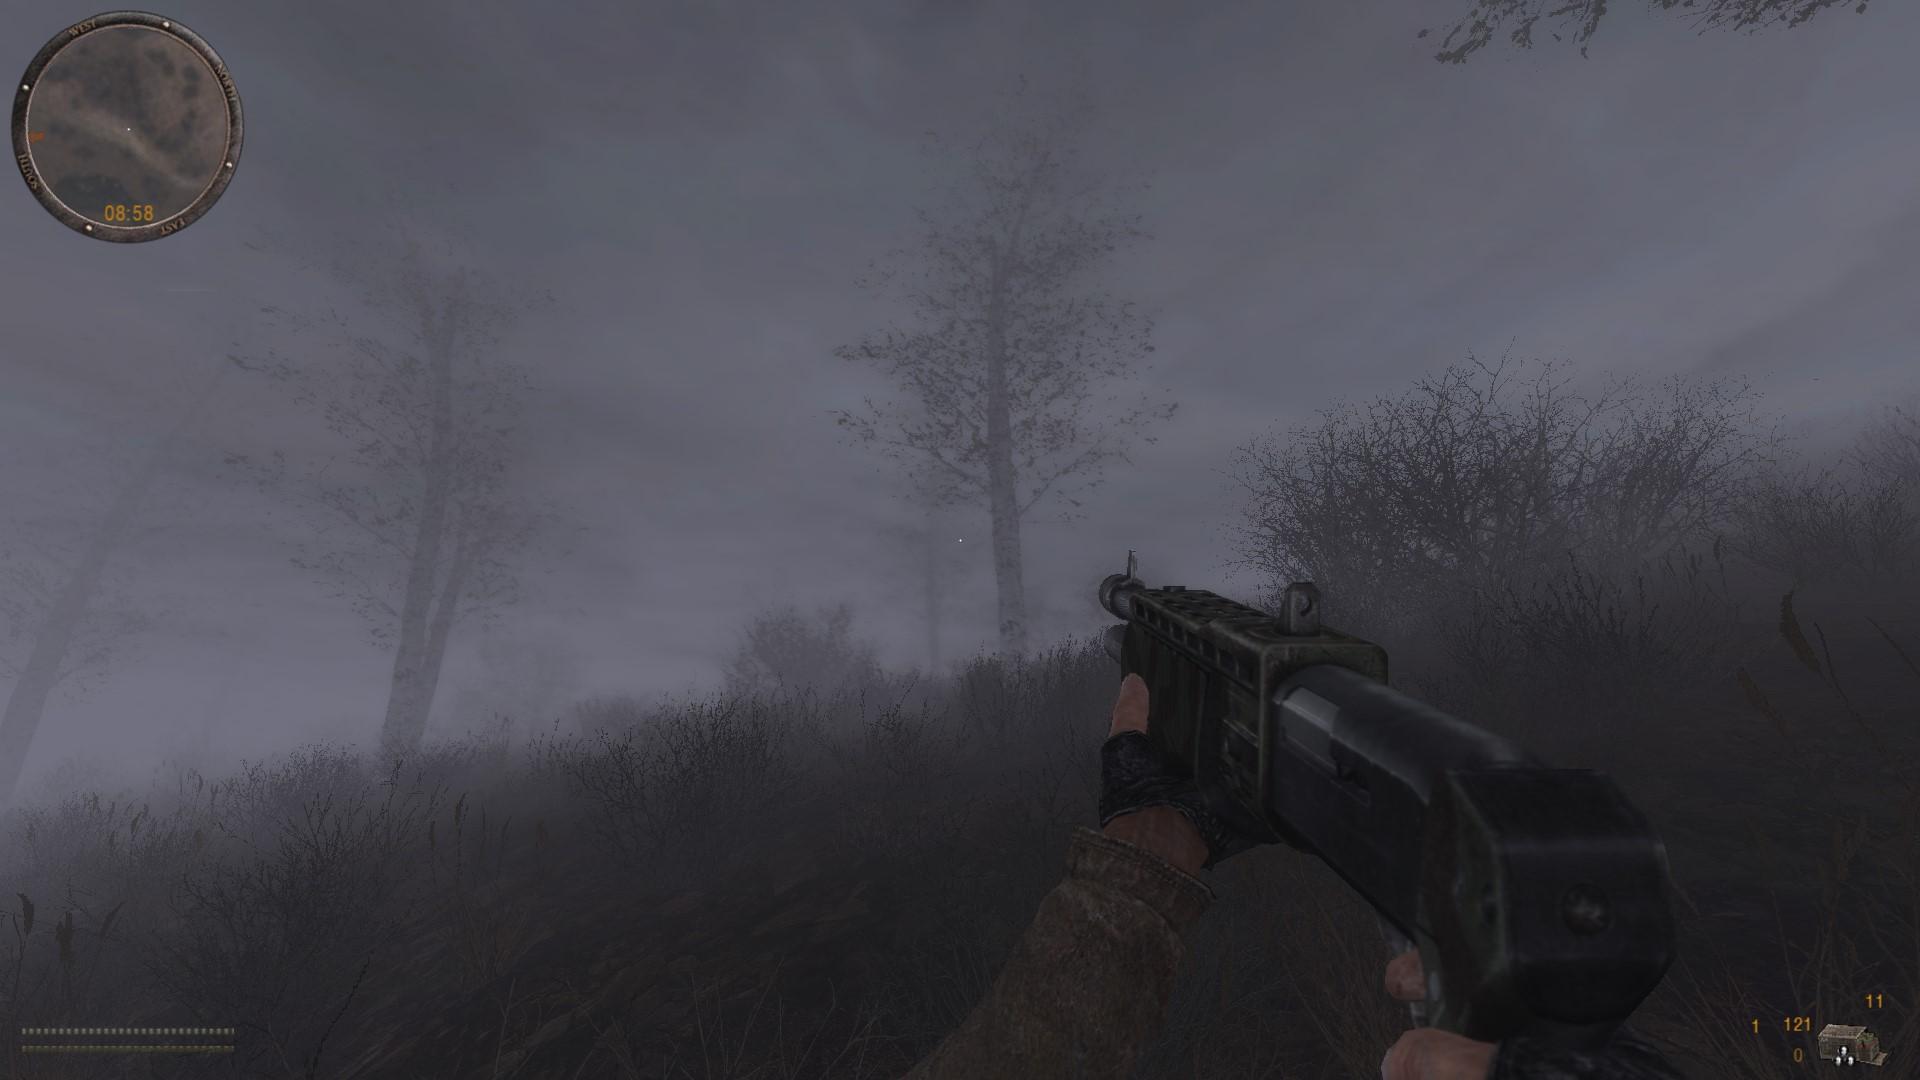 ss_Администратор_05-02-18_21-51-05_(zaton).jpg - S.T.A.L.K.E.R.: Call of Pripyat